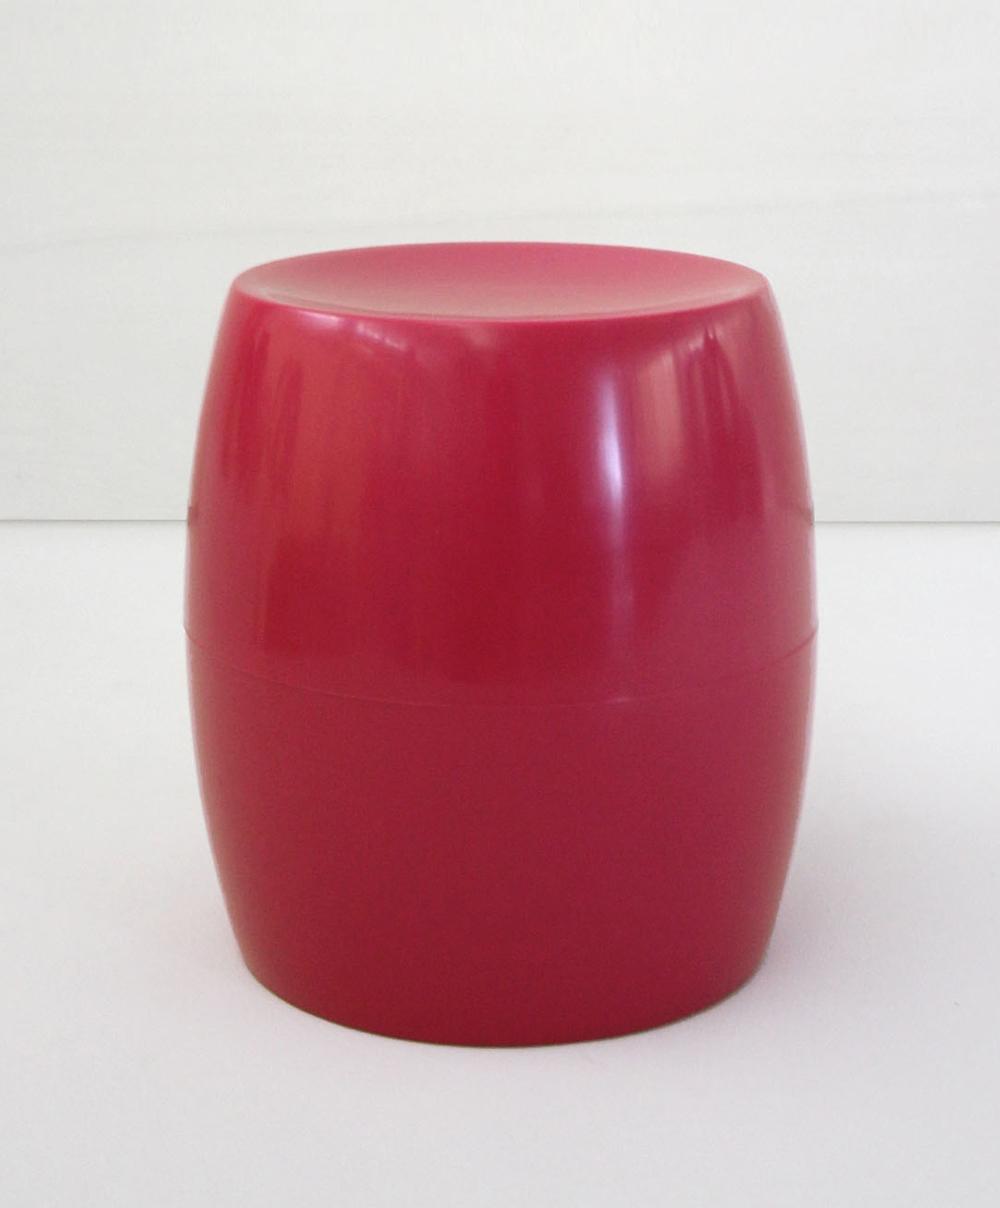 korban flaubert_tangerine bongo stool